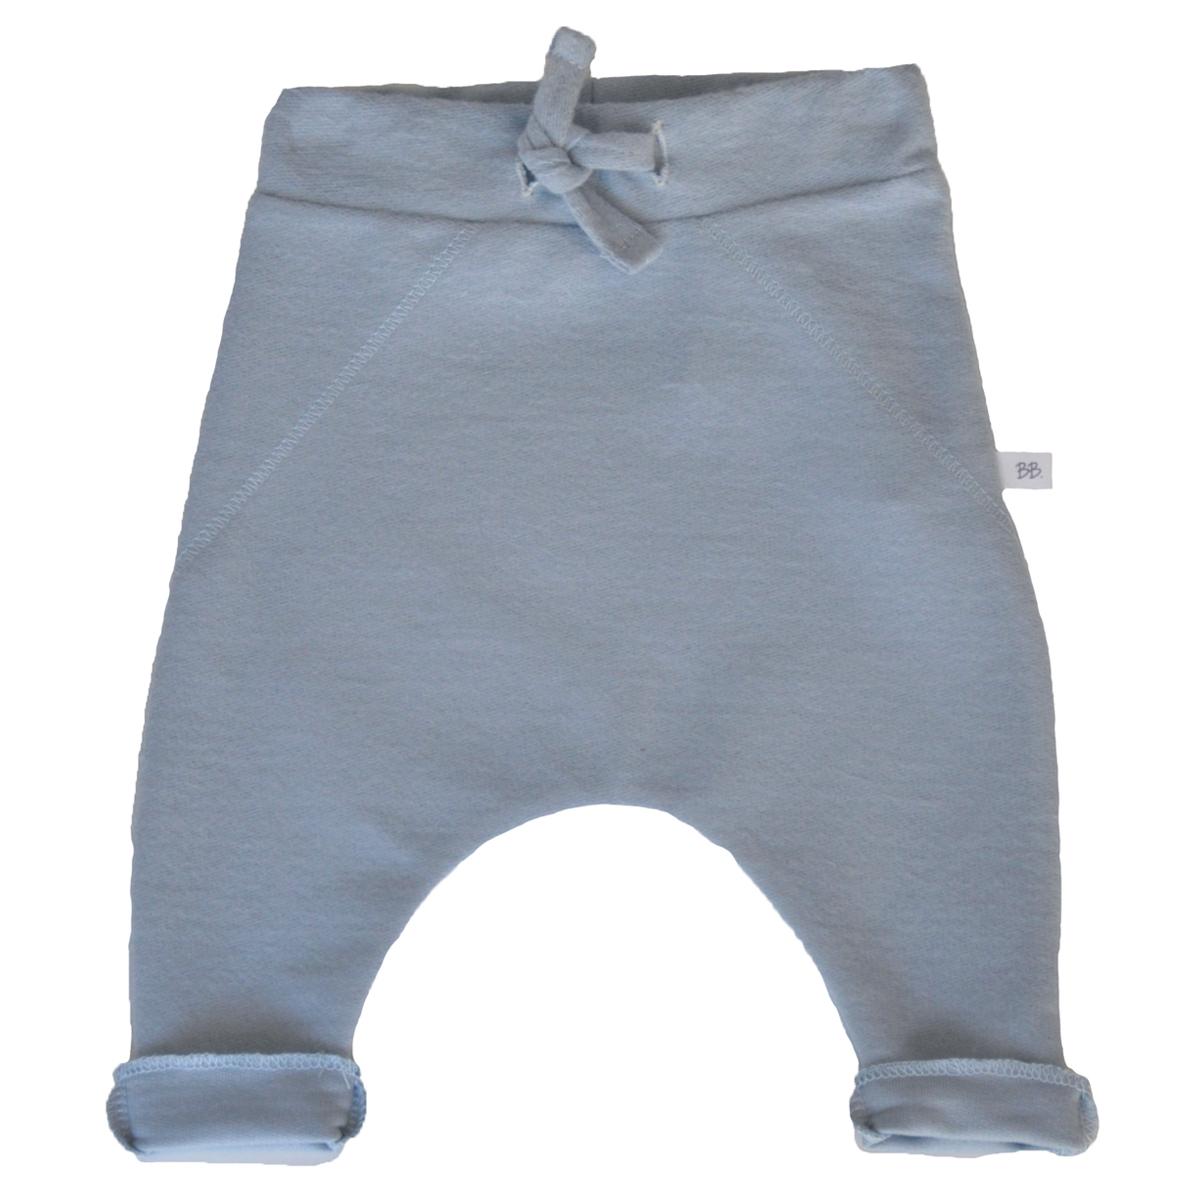 Bas bébé Jogging Bleu - 3 Mois Jogging Bleu - 3 Mois